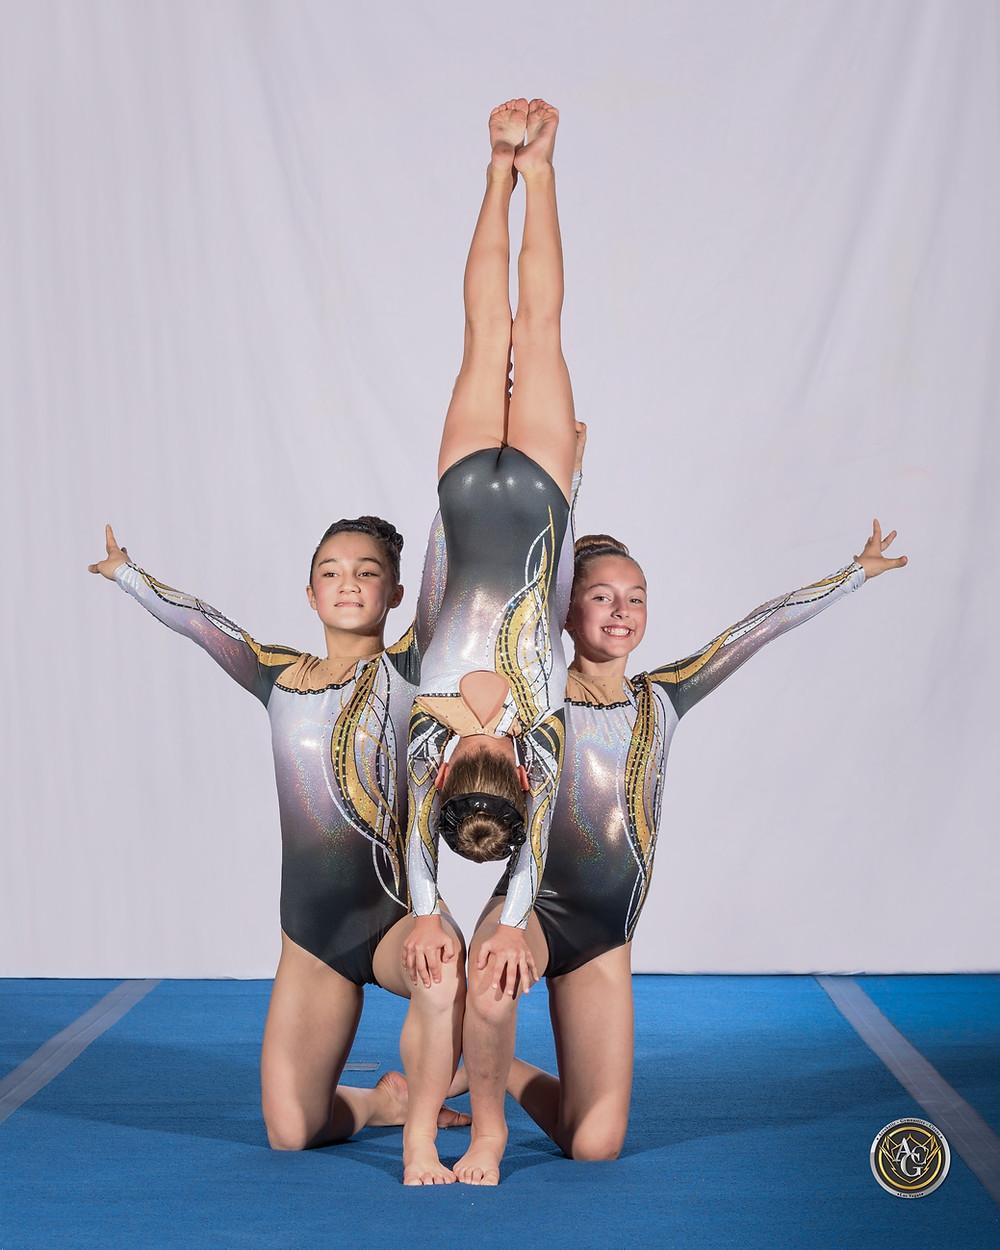 """Recreational Gymnastics In Las Vegas'"